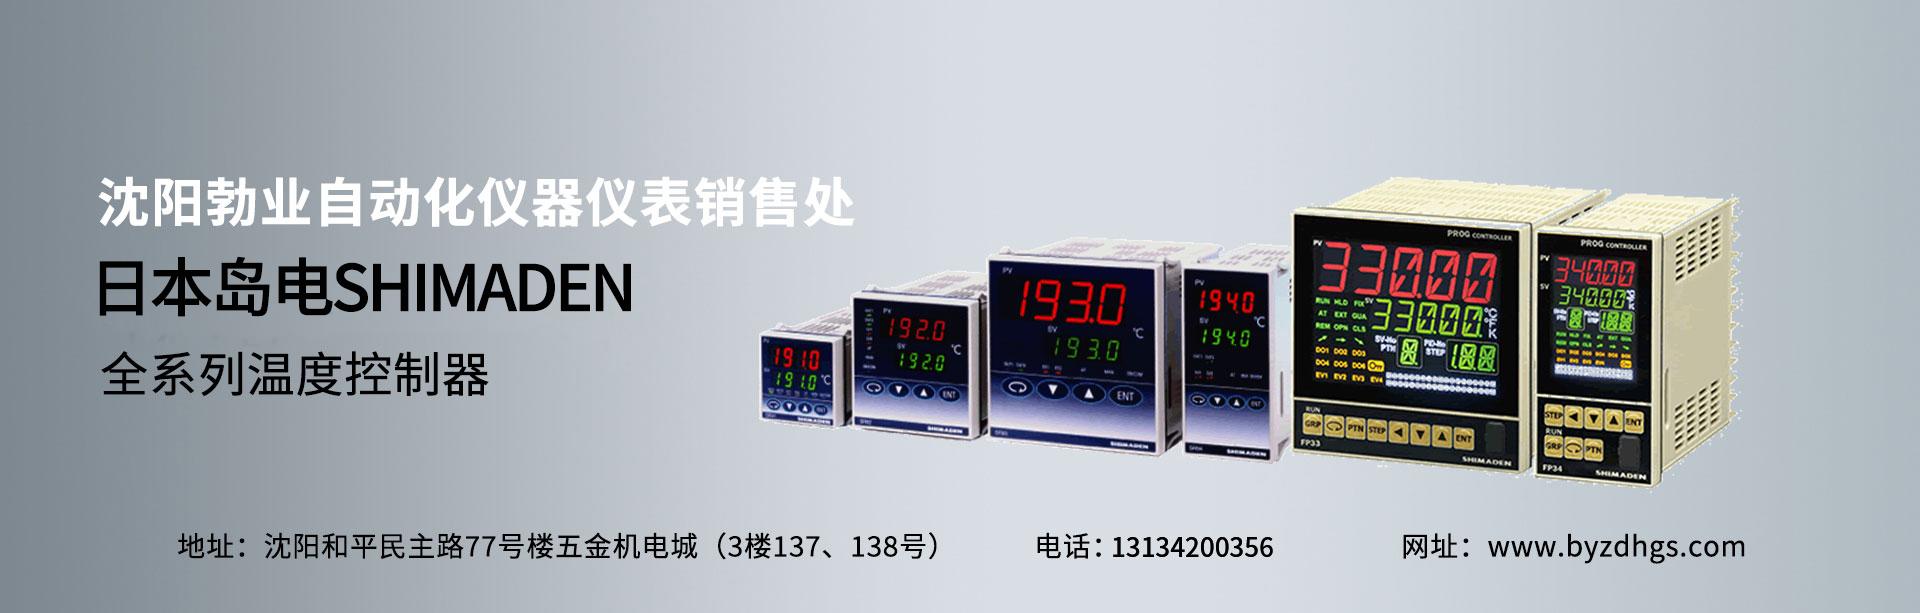 http://www.byzdhgs.com/product-1042.html